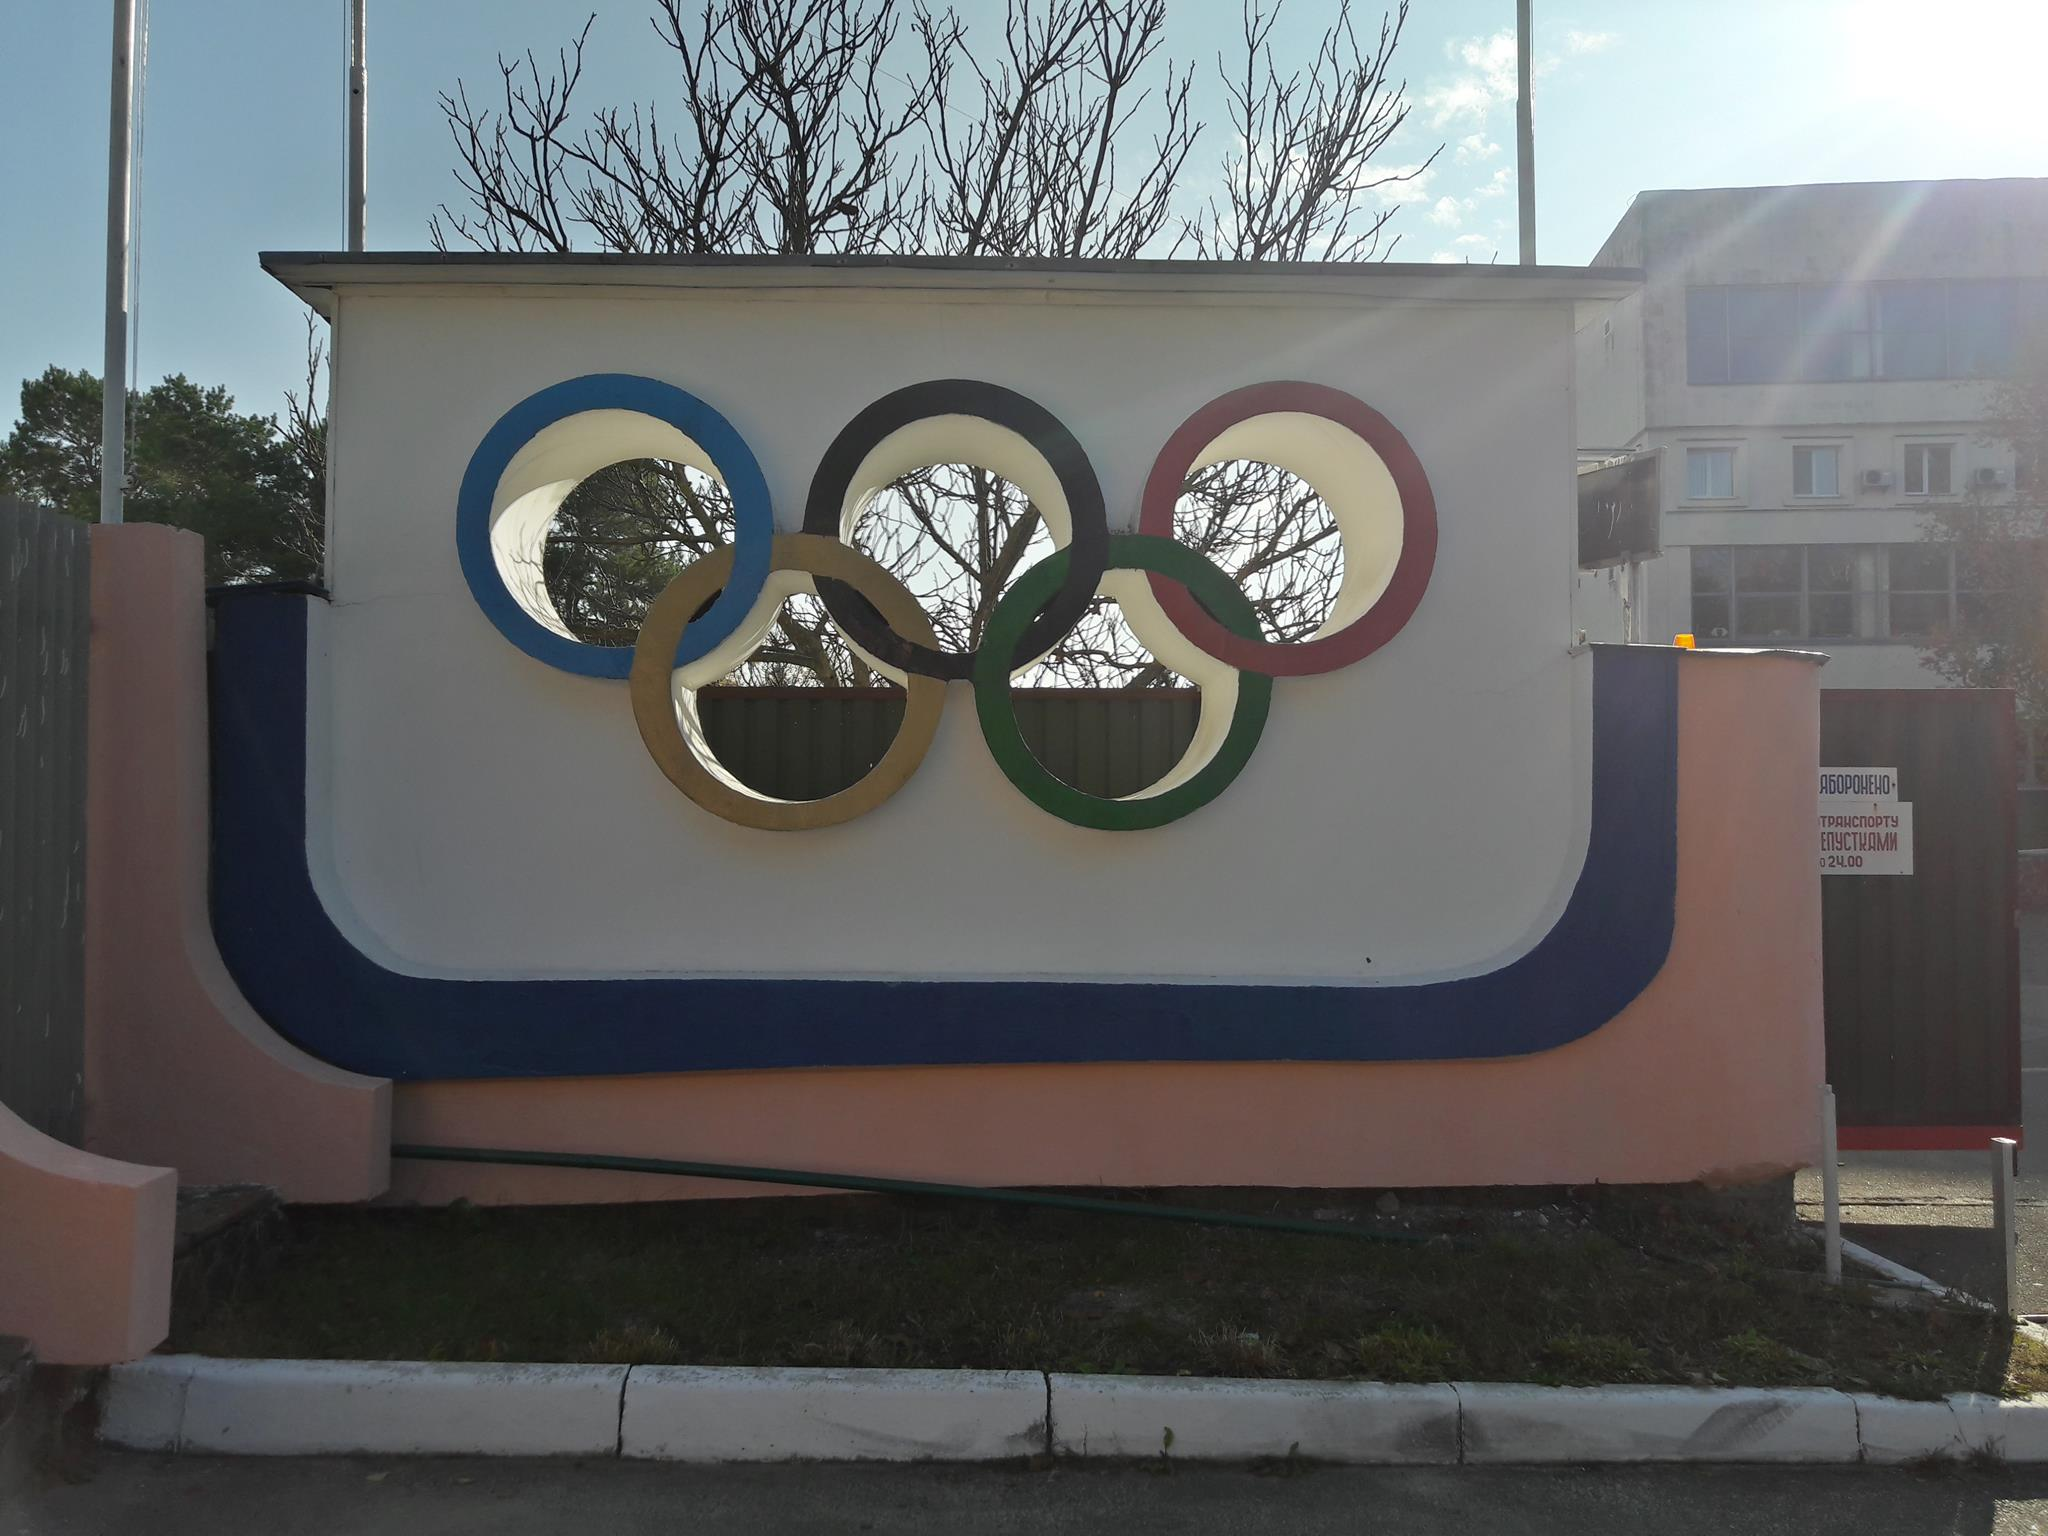 Конча заспа олимпийская база